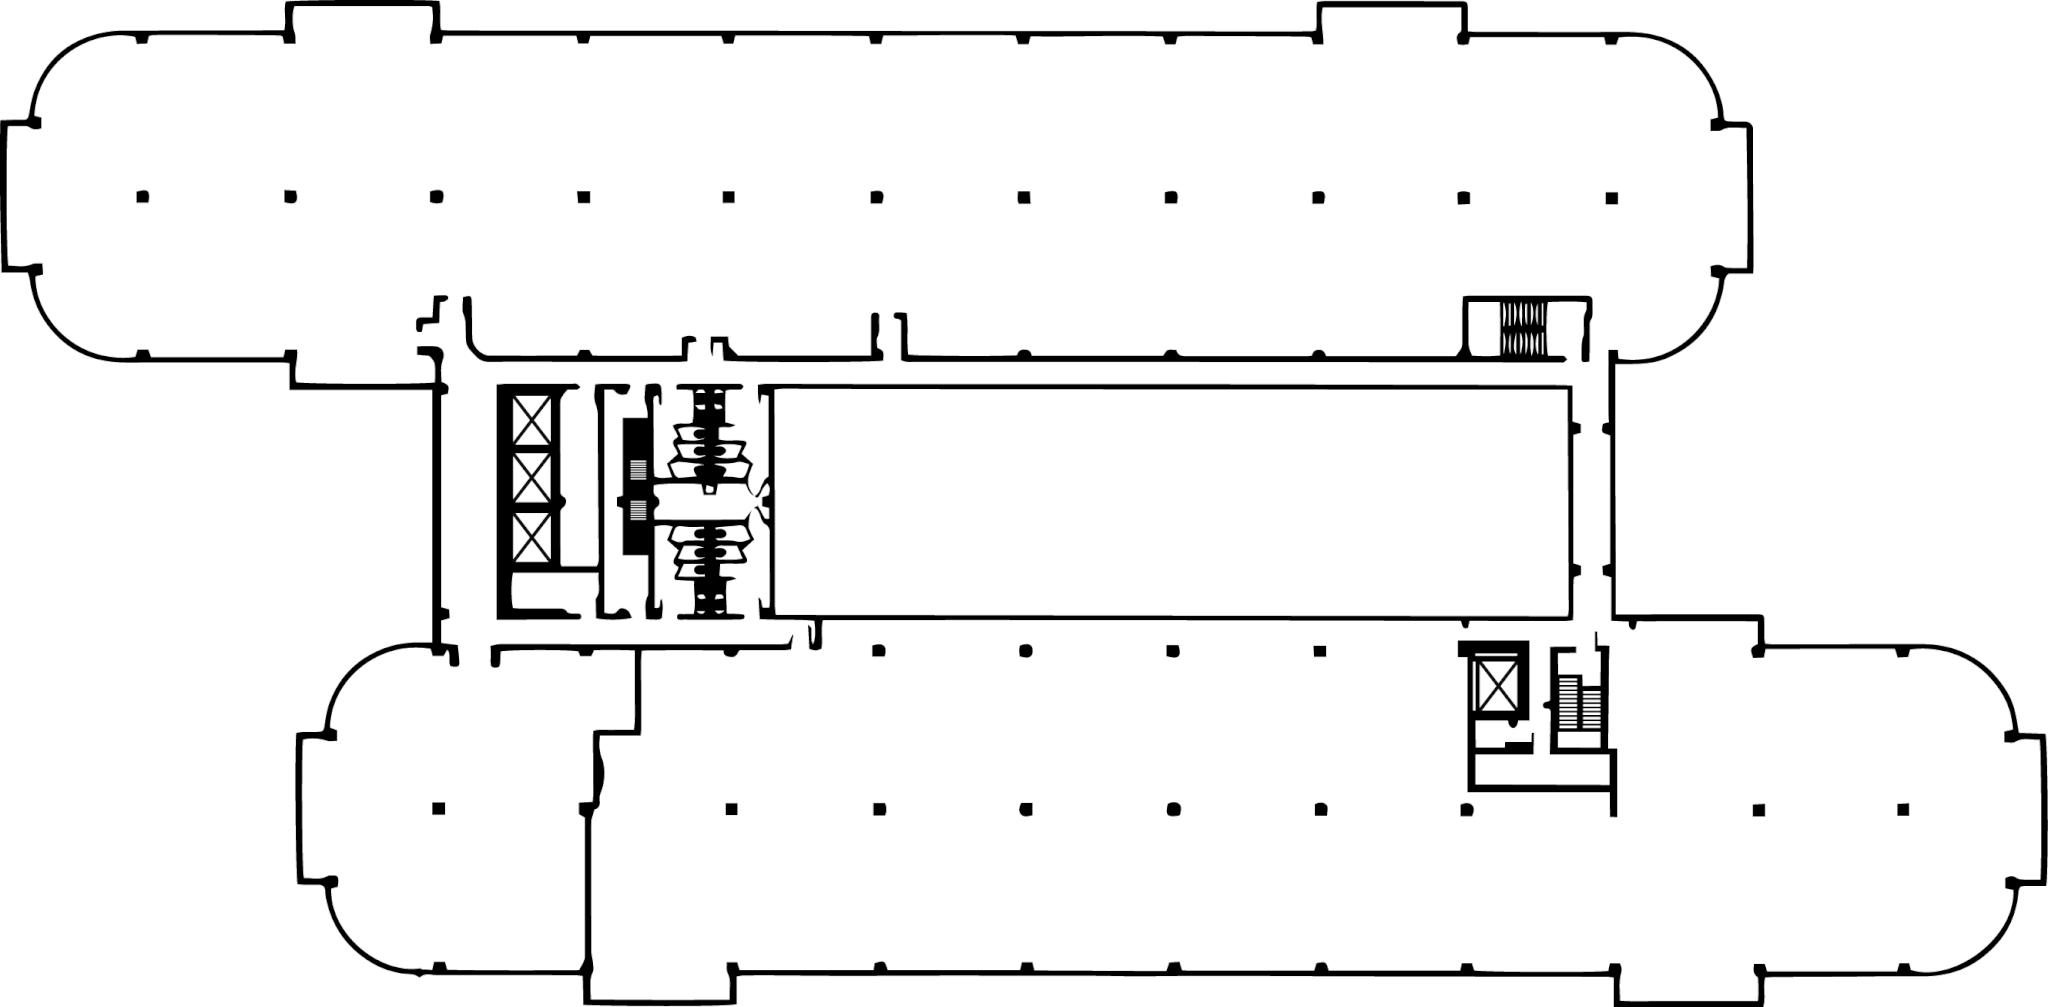 Floor Plan for Corporate Plaza